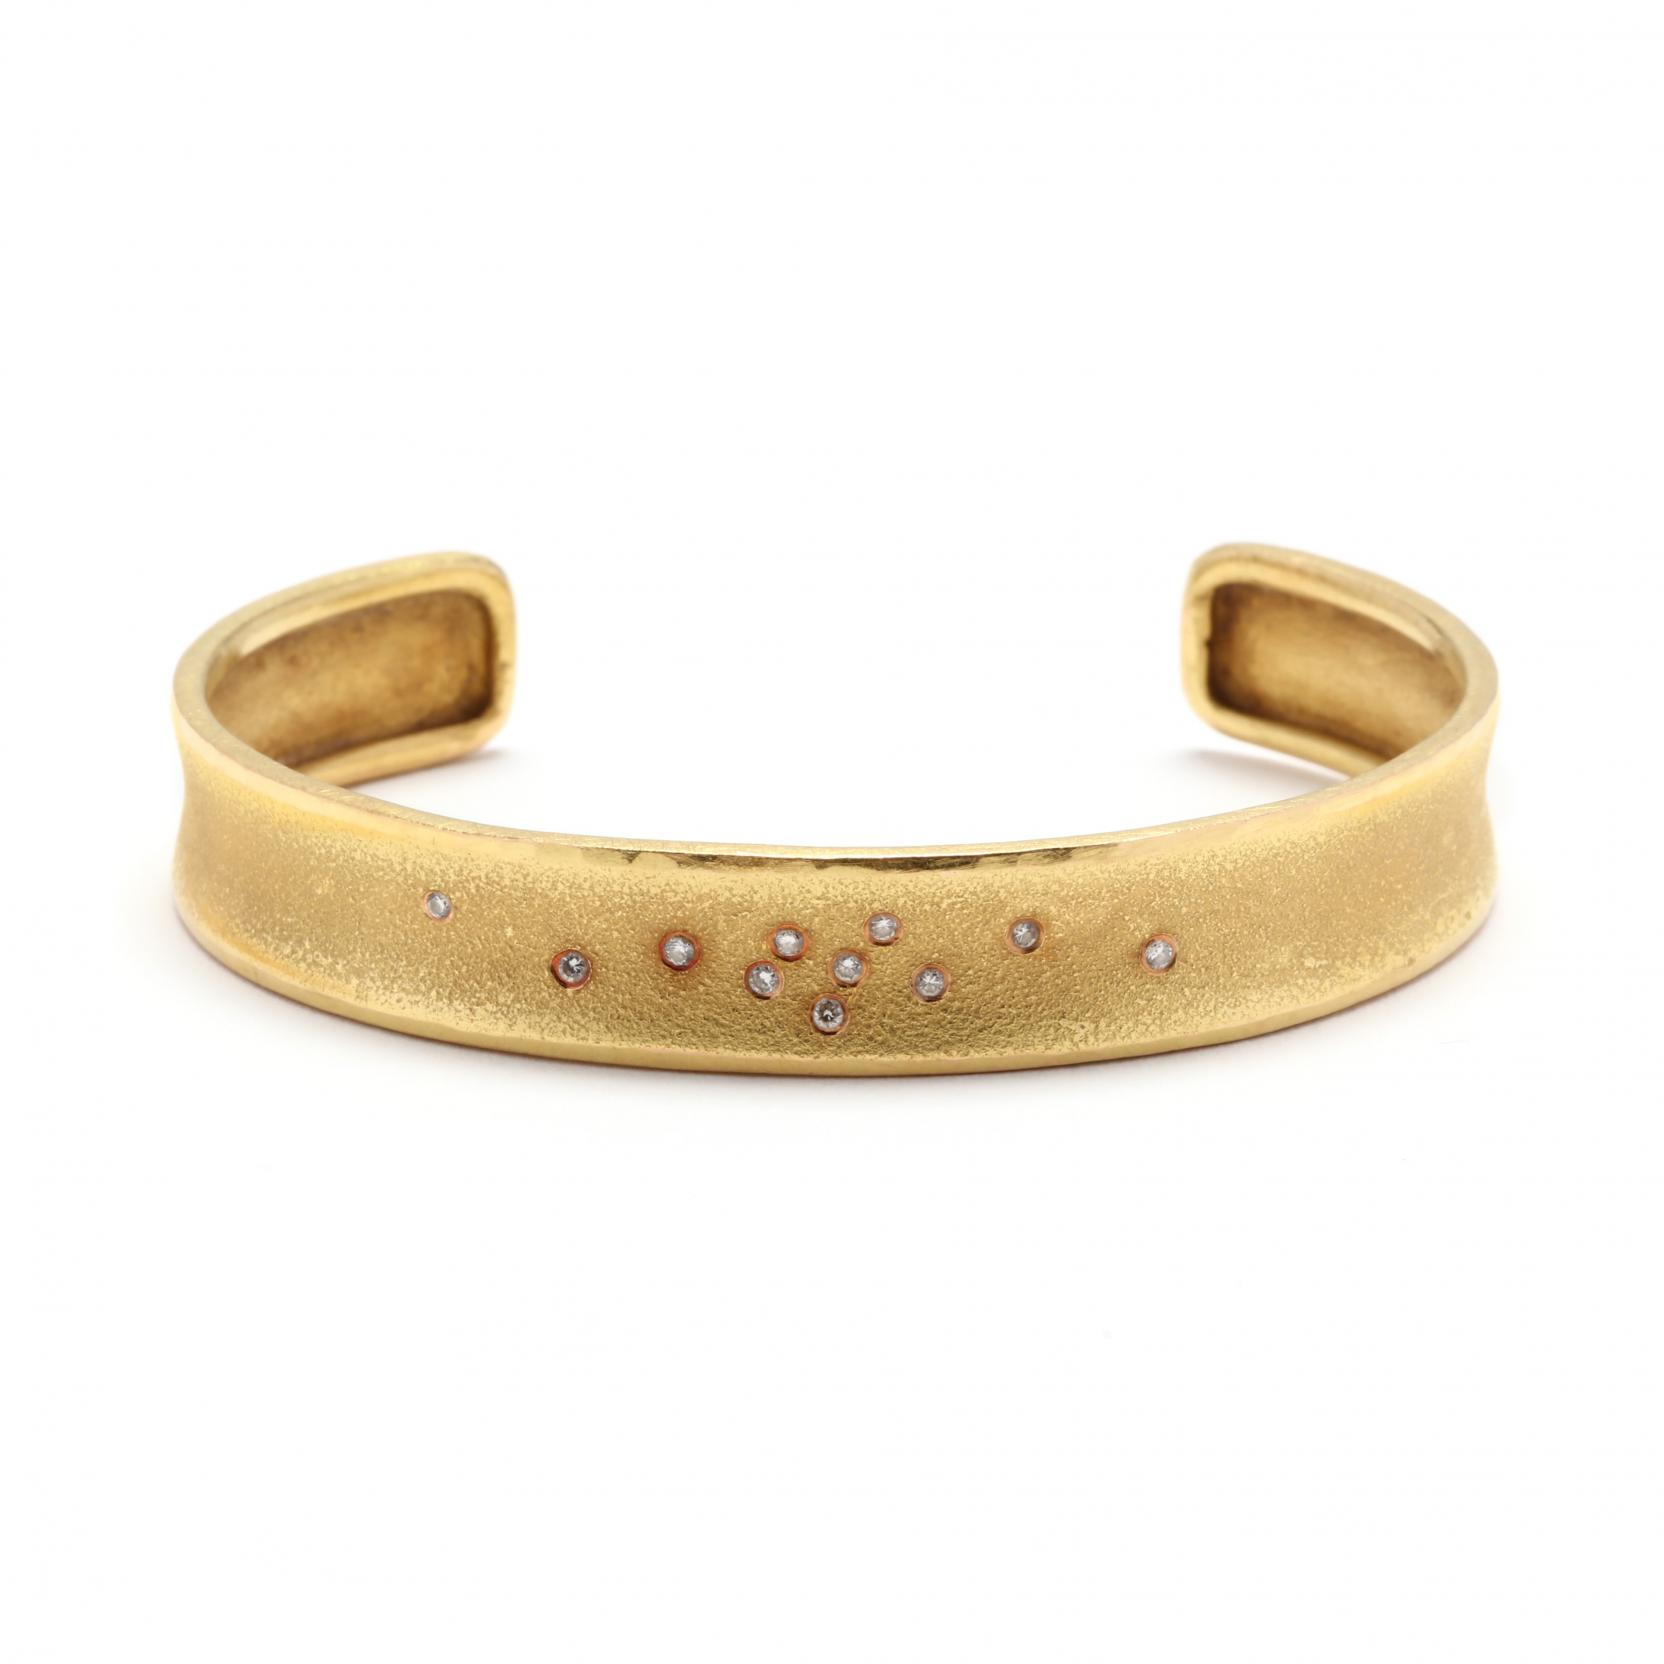 18kt-gold-and-diamond-cuff-bracelet-zolotas